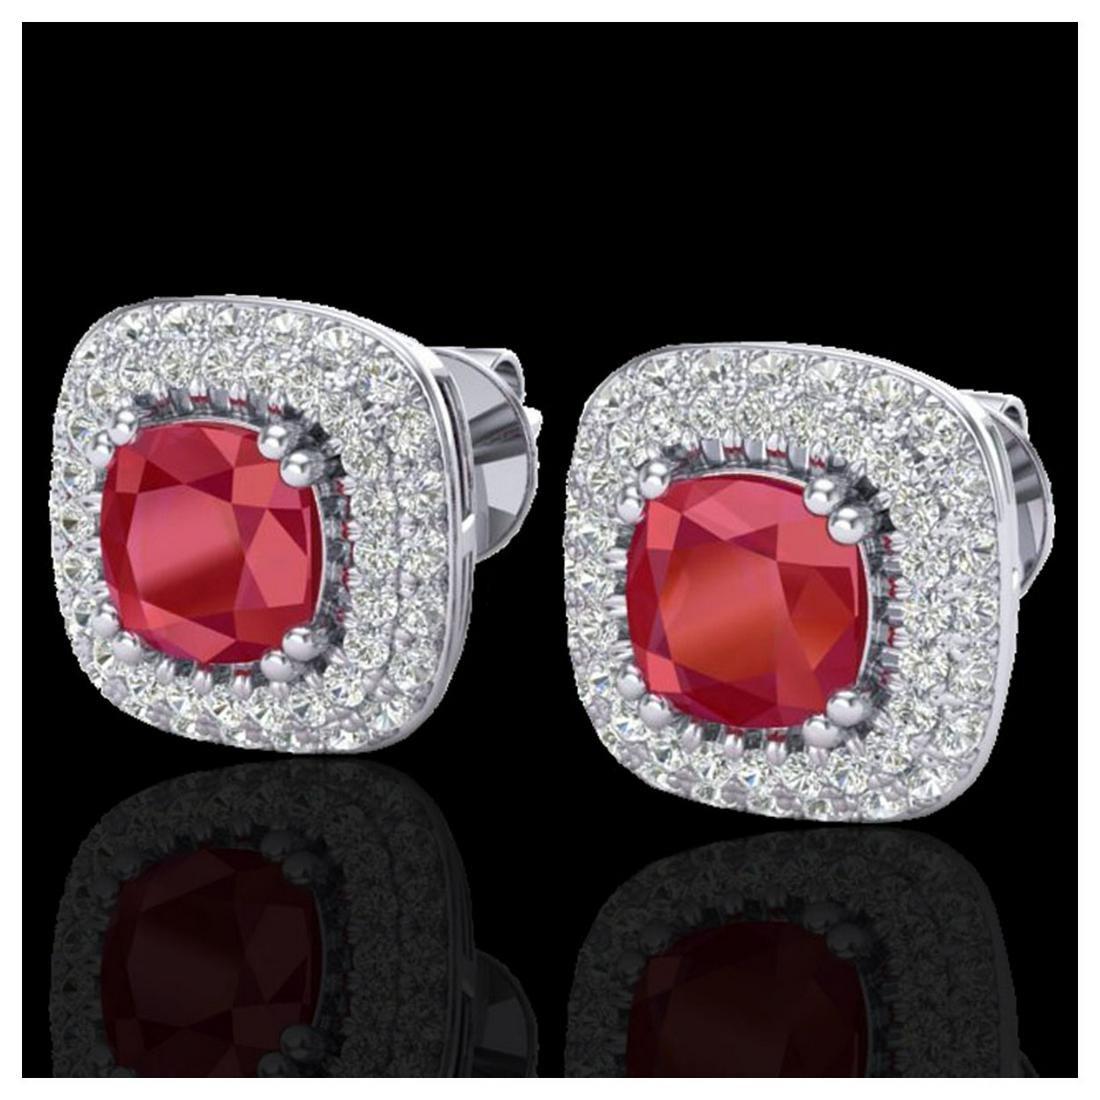 2.16 ctw Ruby & VS/SI Diamond Earrings Halo 18K White